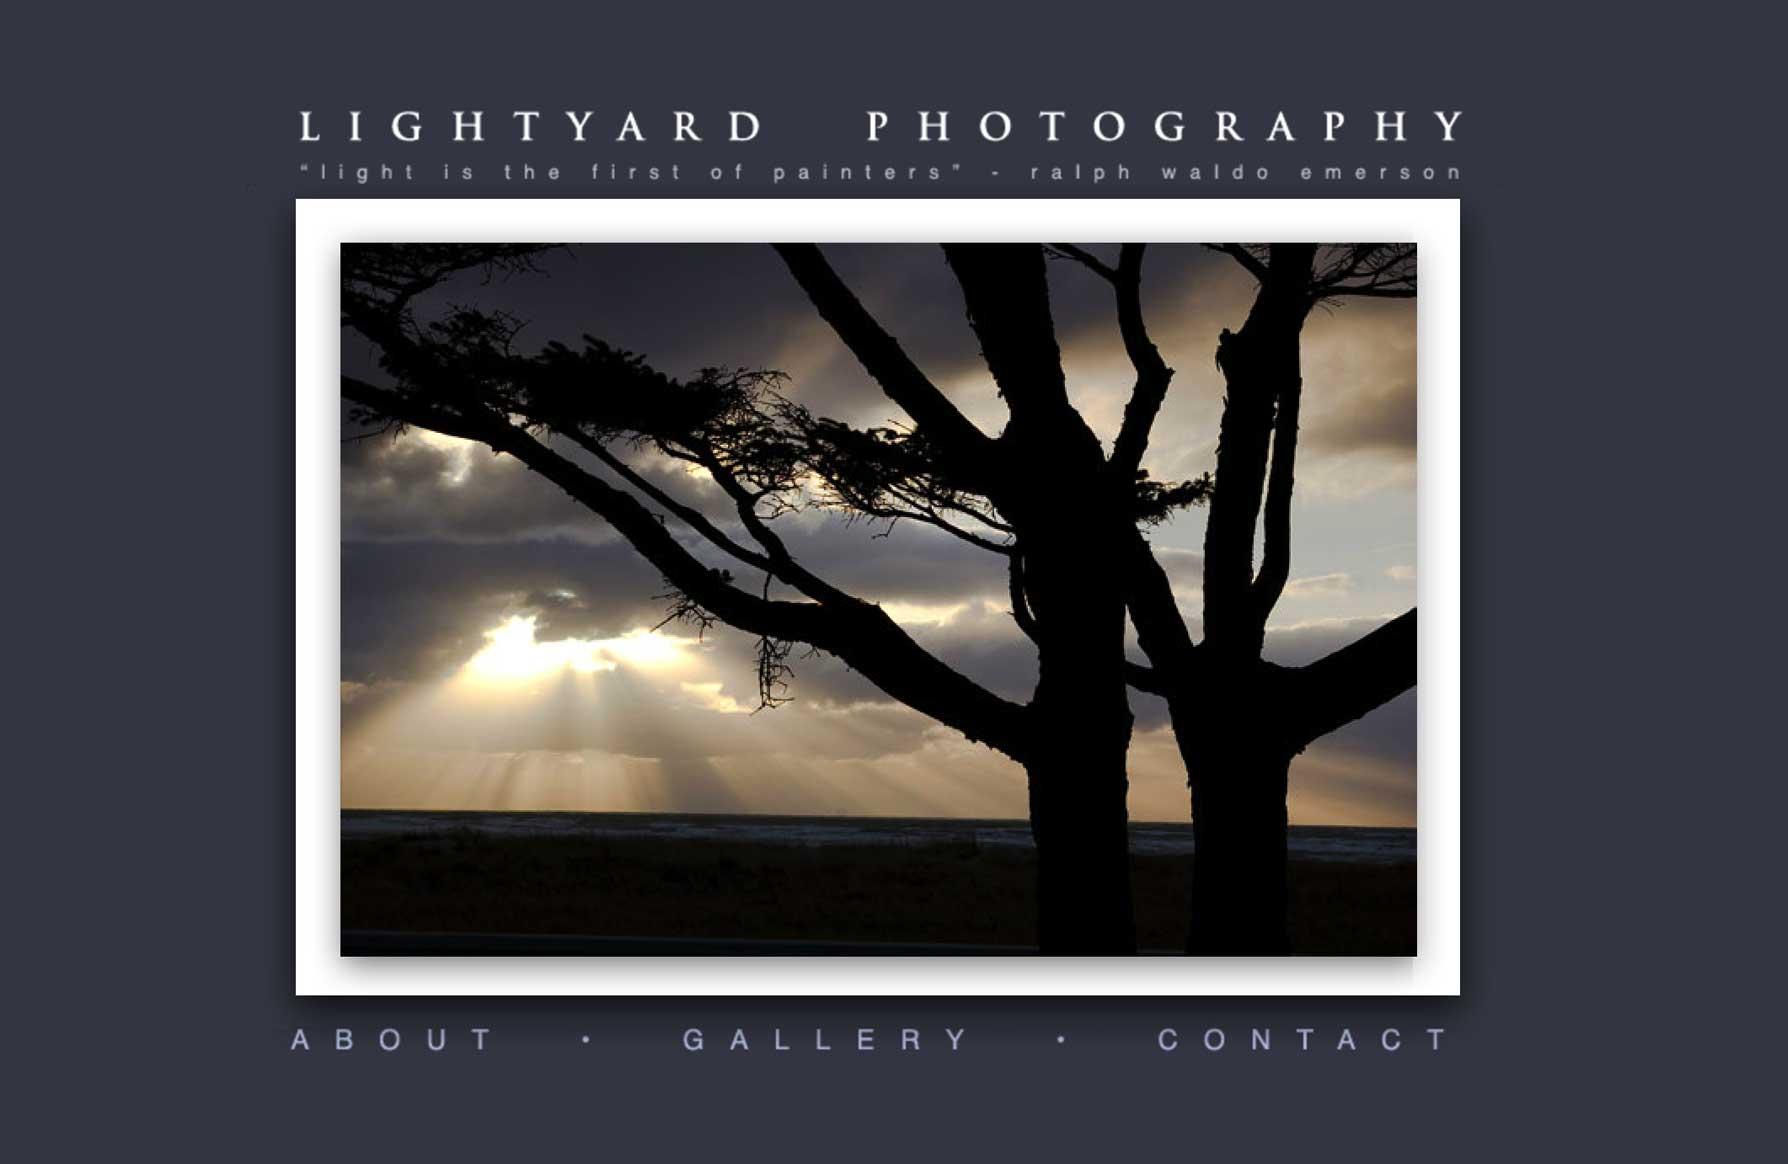 Lightyard Photography